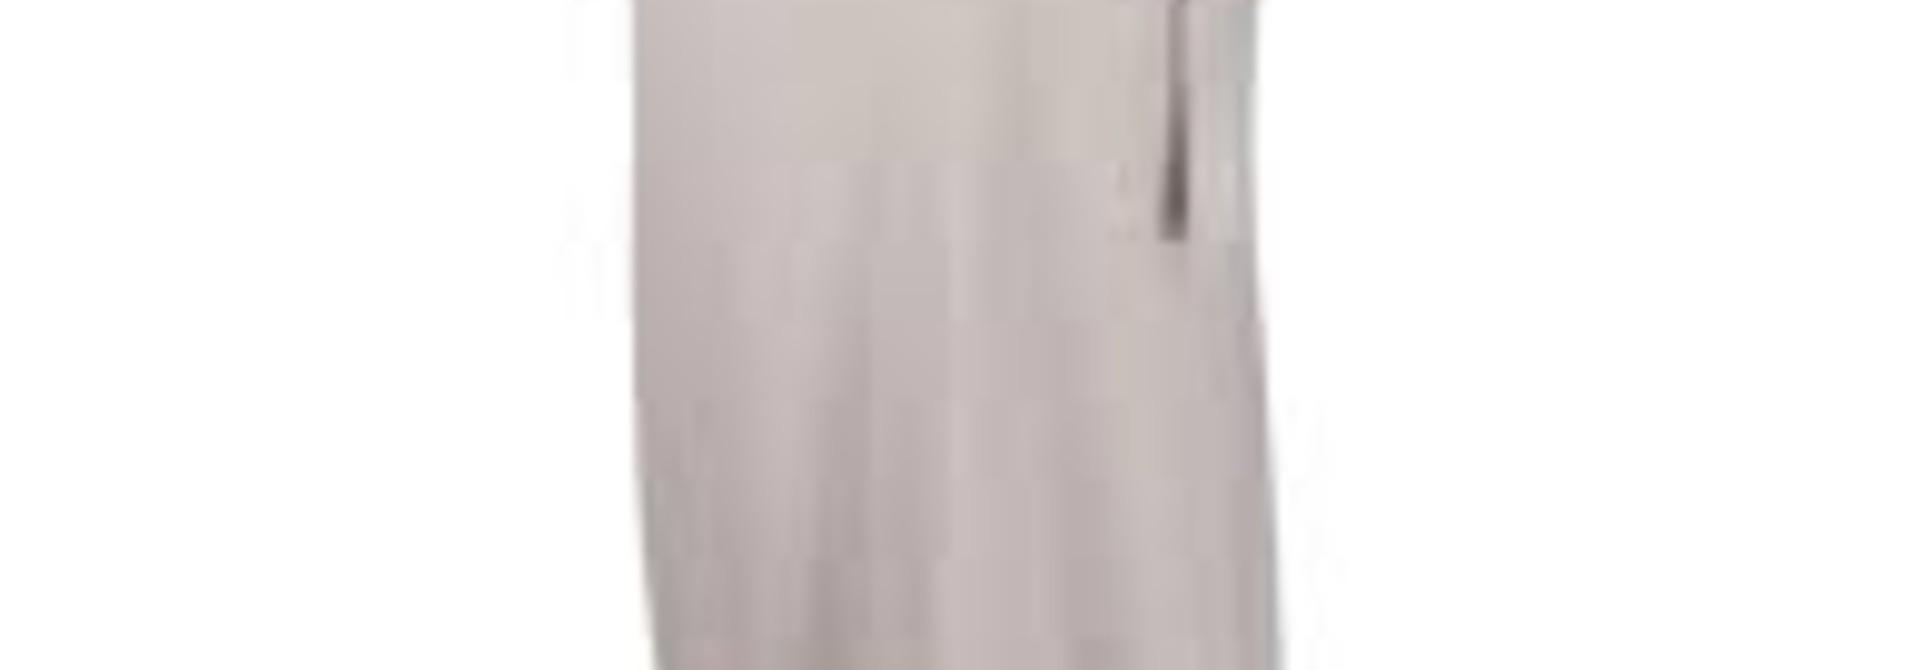 Skirt - Max Wrap - Lt. Grey - Sz. 38